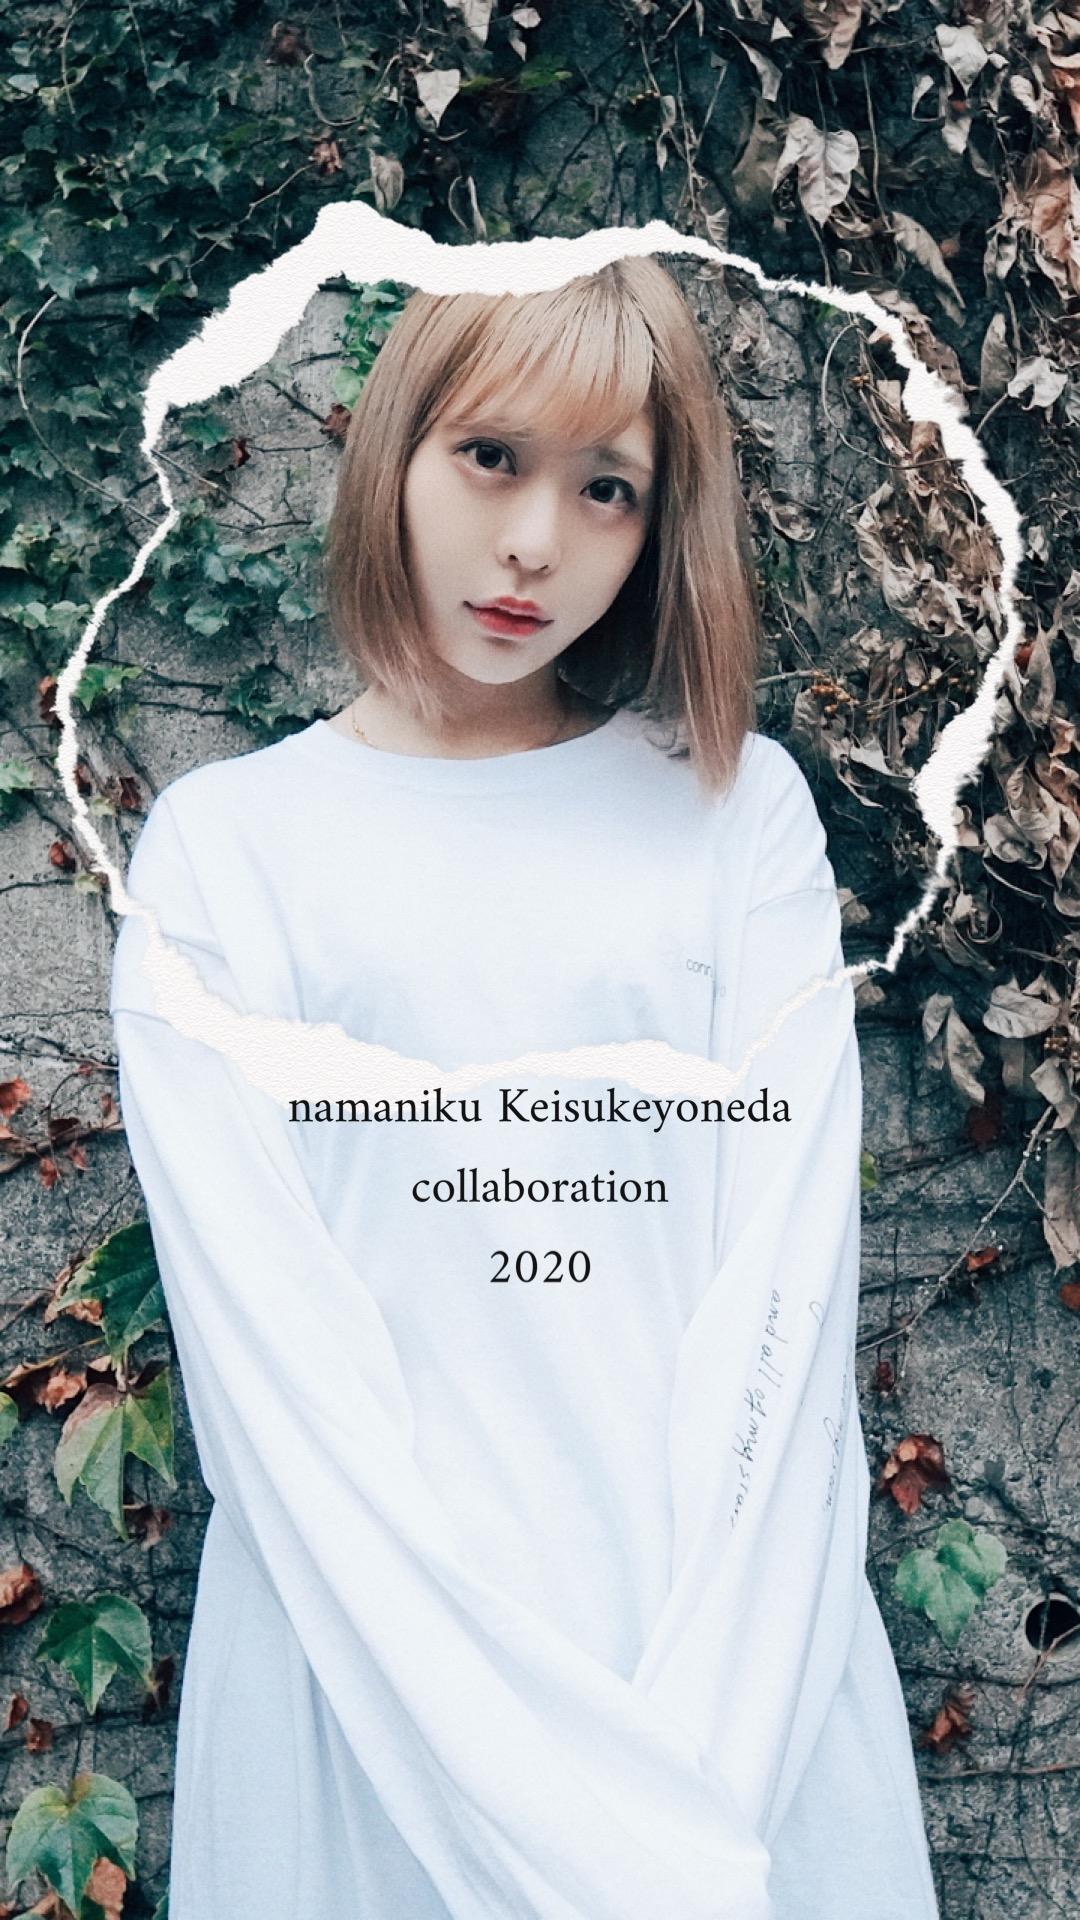 Namanik ex七海ゆあ collaboration